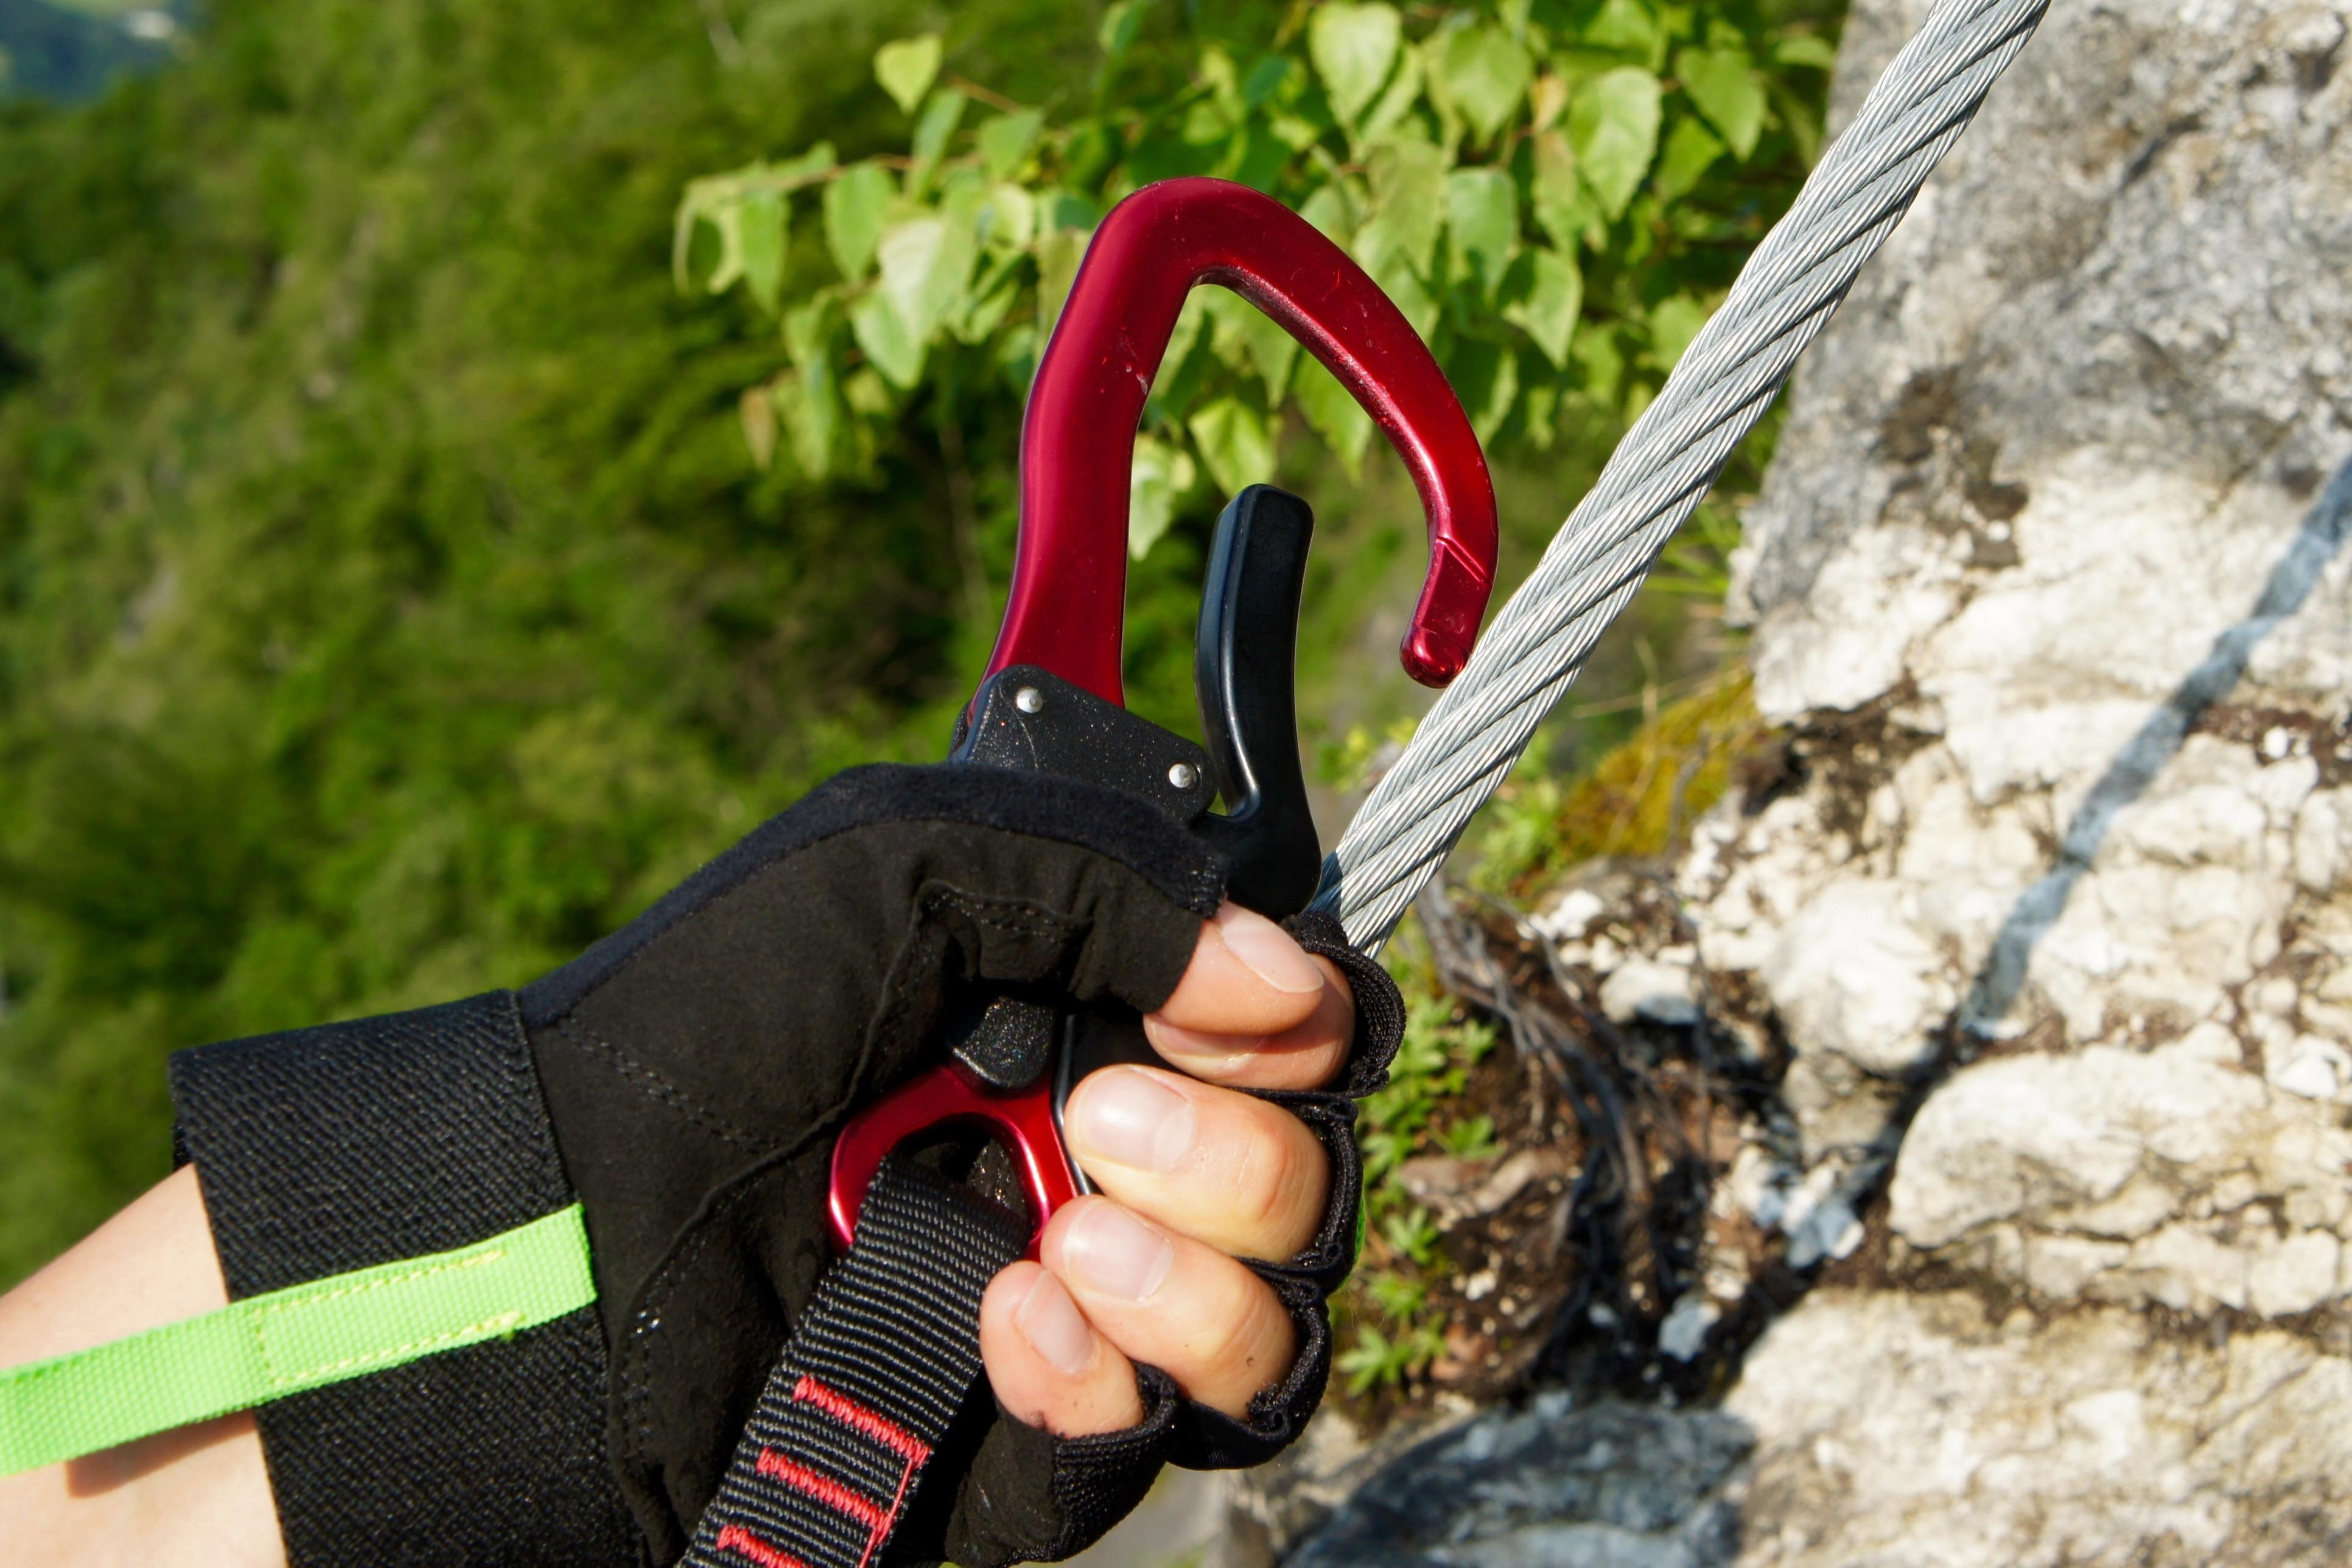 Klettersteig Set : Dinge für den klettersteig bergwelten